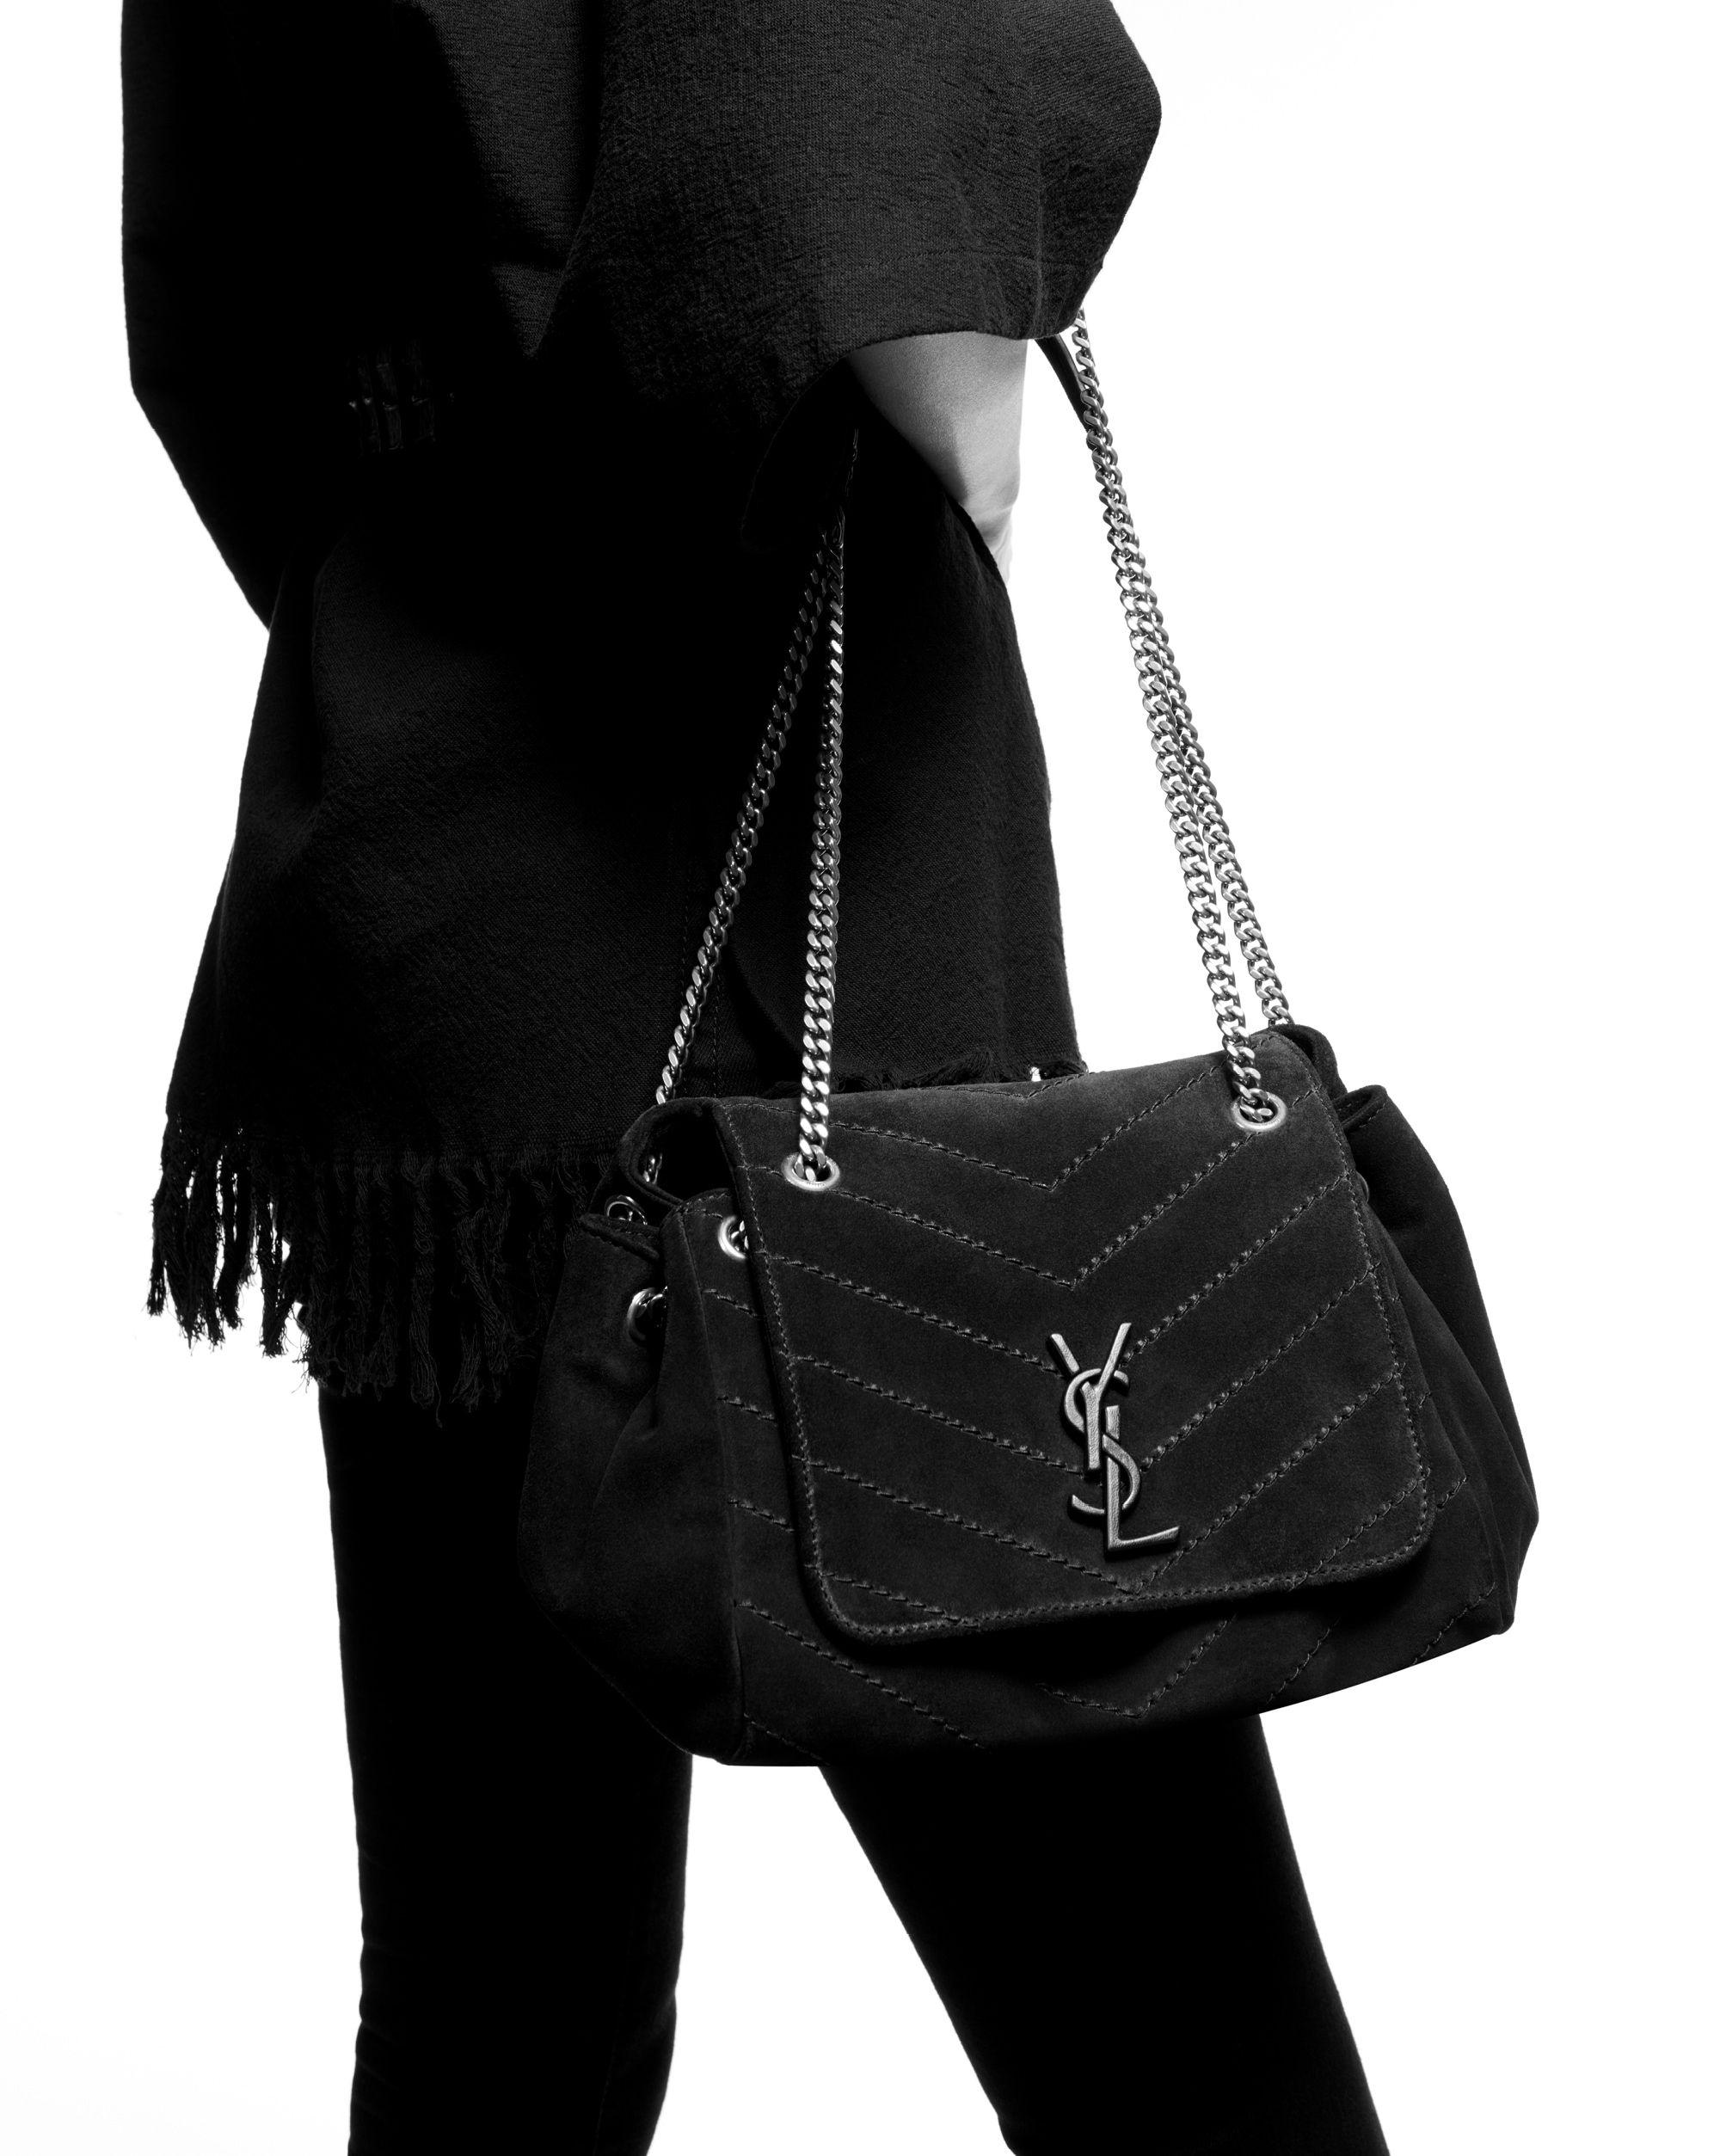 dd5f359f1e Small Nolita chain bag in suede in 2019 | It's All in the Details ...